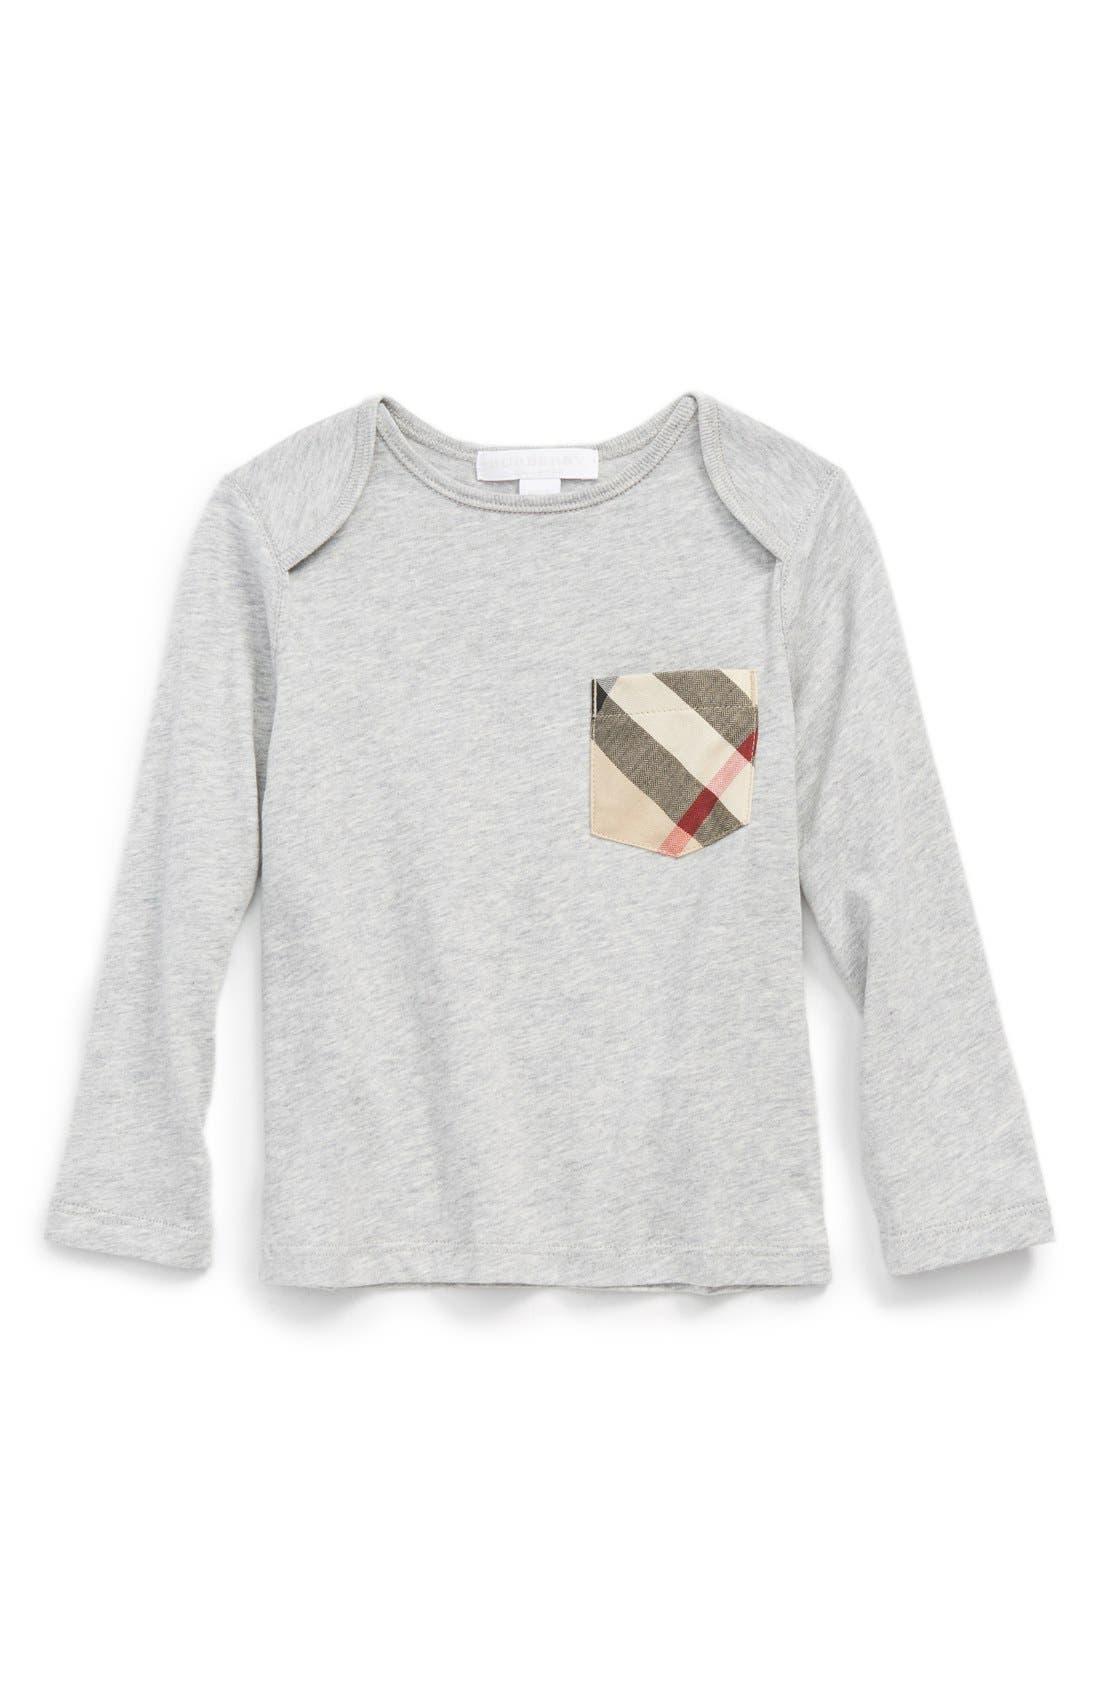 'Callum' Check Print Chest Pocket T-Shirt,                         Main,                         color, 035